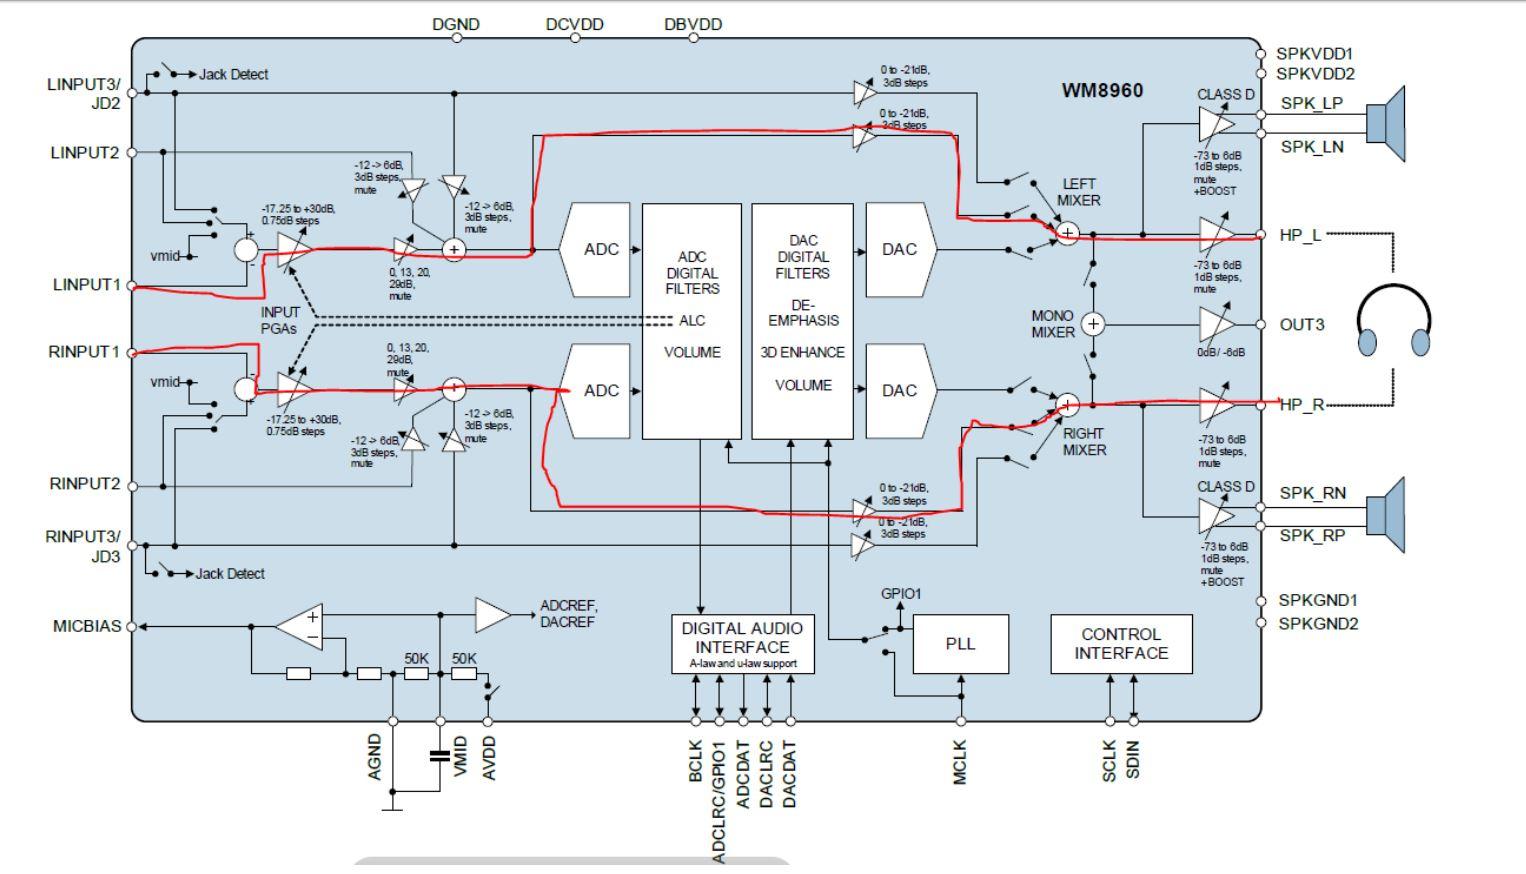 imx6 audio wm8960 speaker path